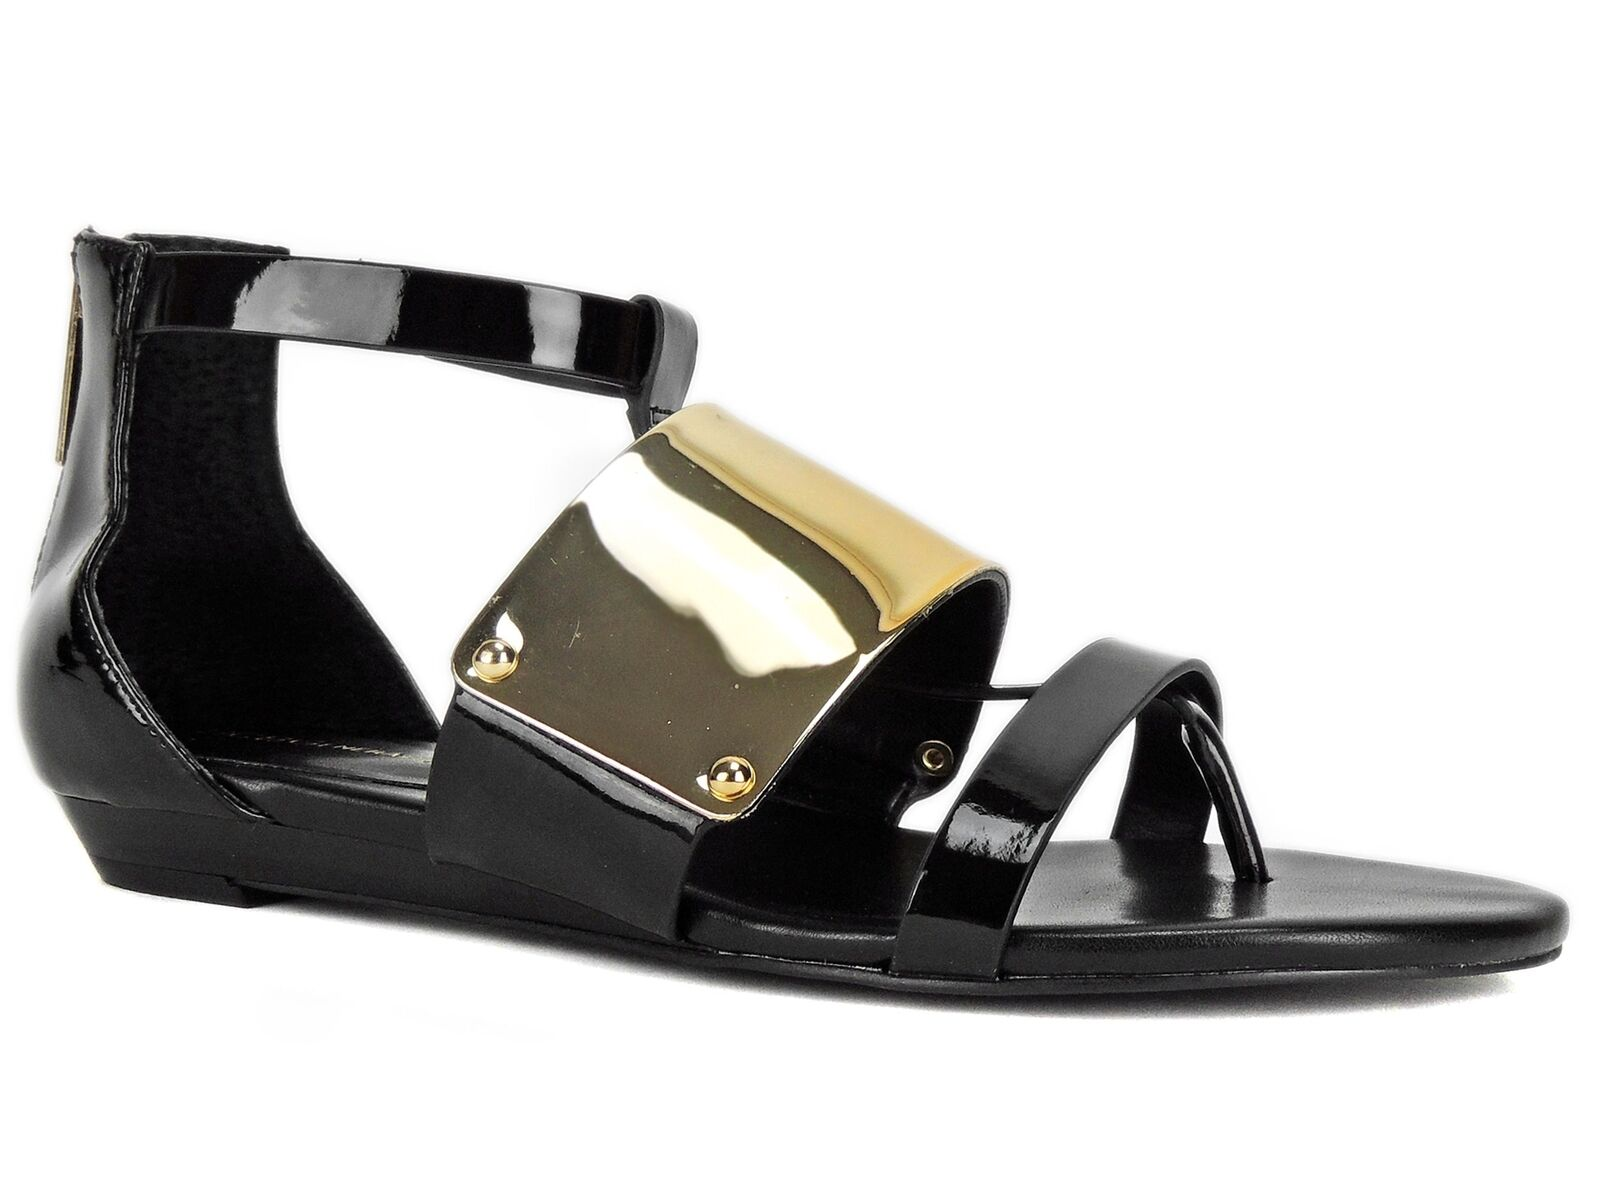 BCBGeneration Women's Angelika Gladiator Flat Thong Sandal Black Patent Size 6 M